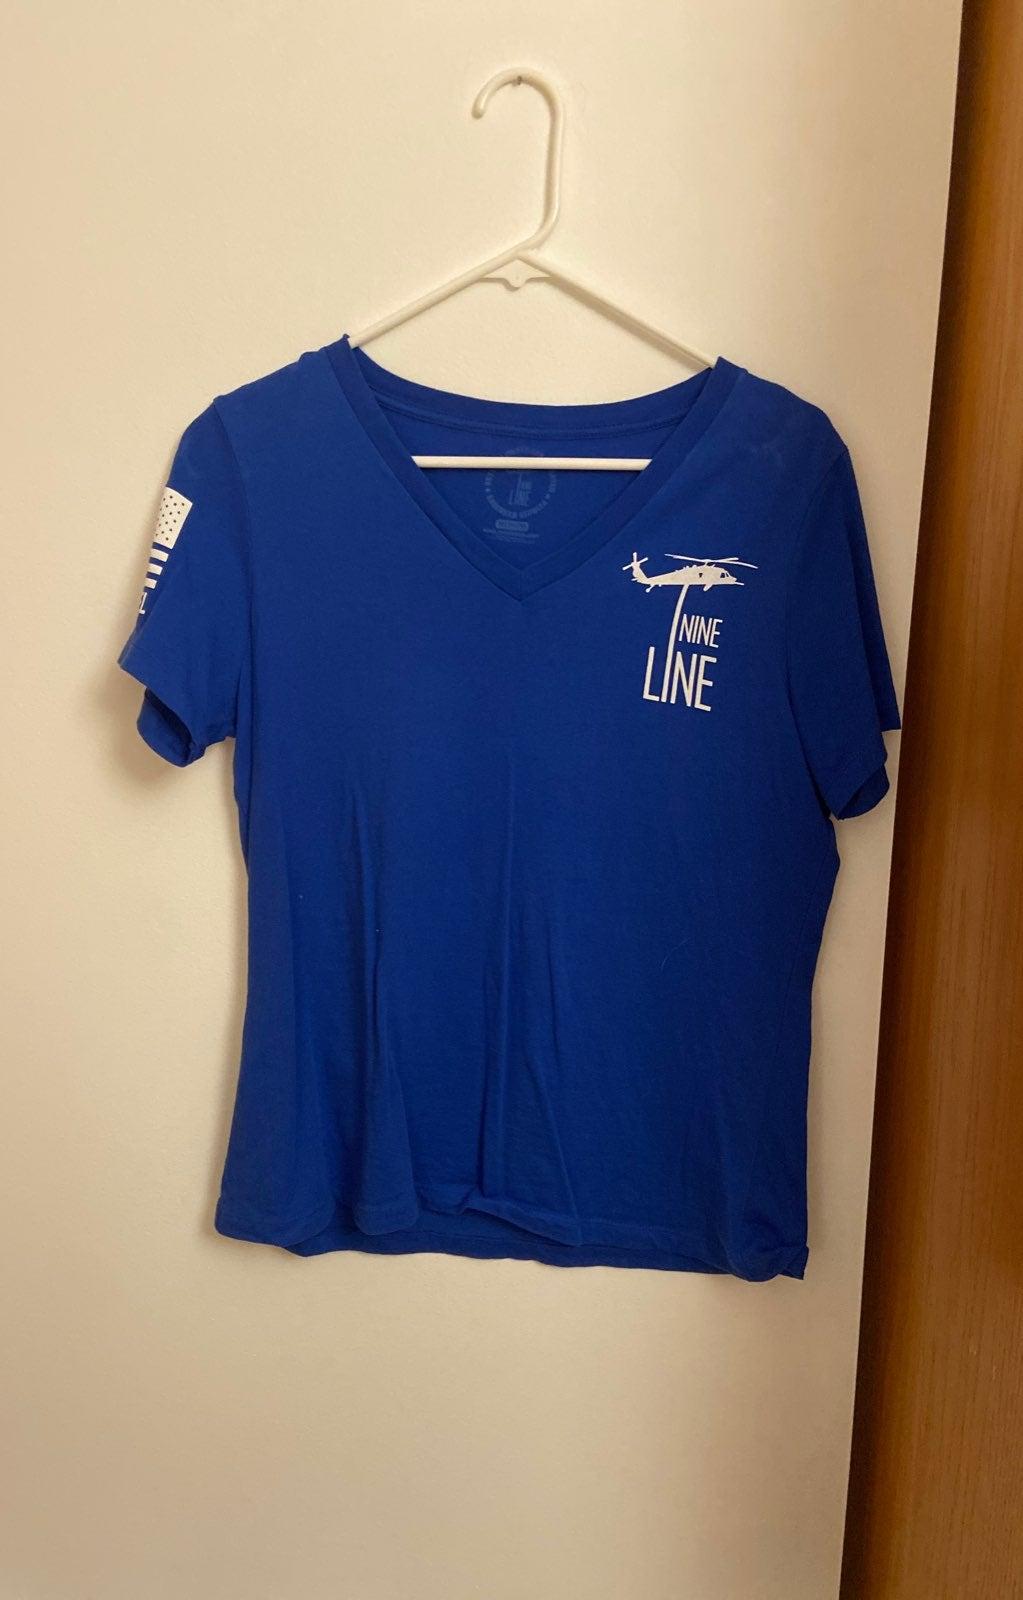 Nine Line shirt